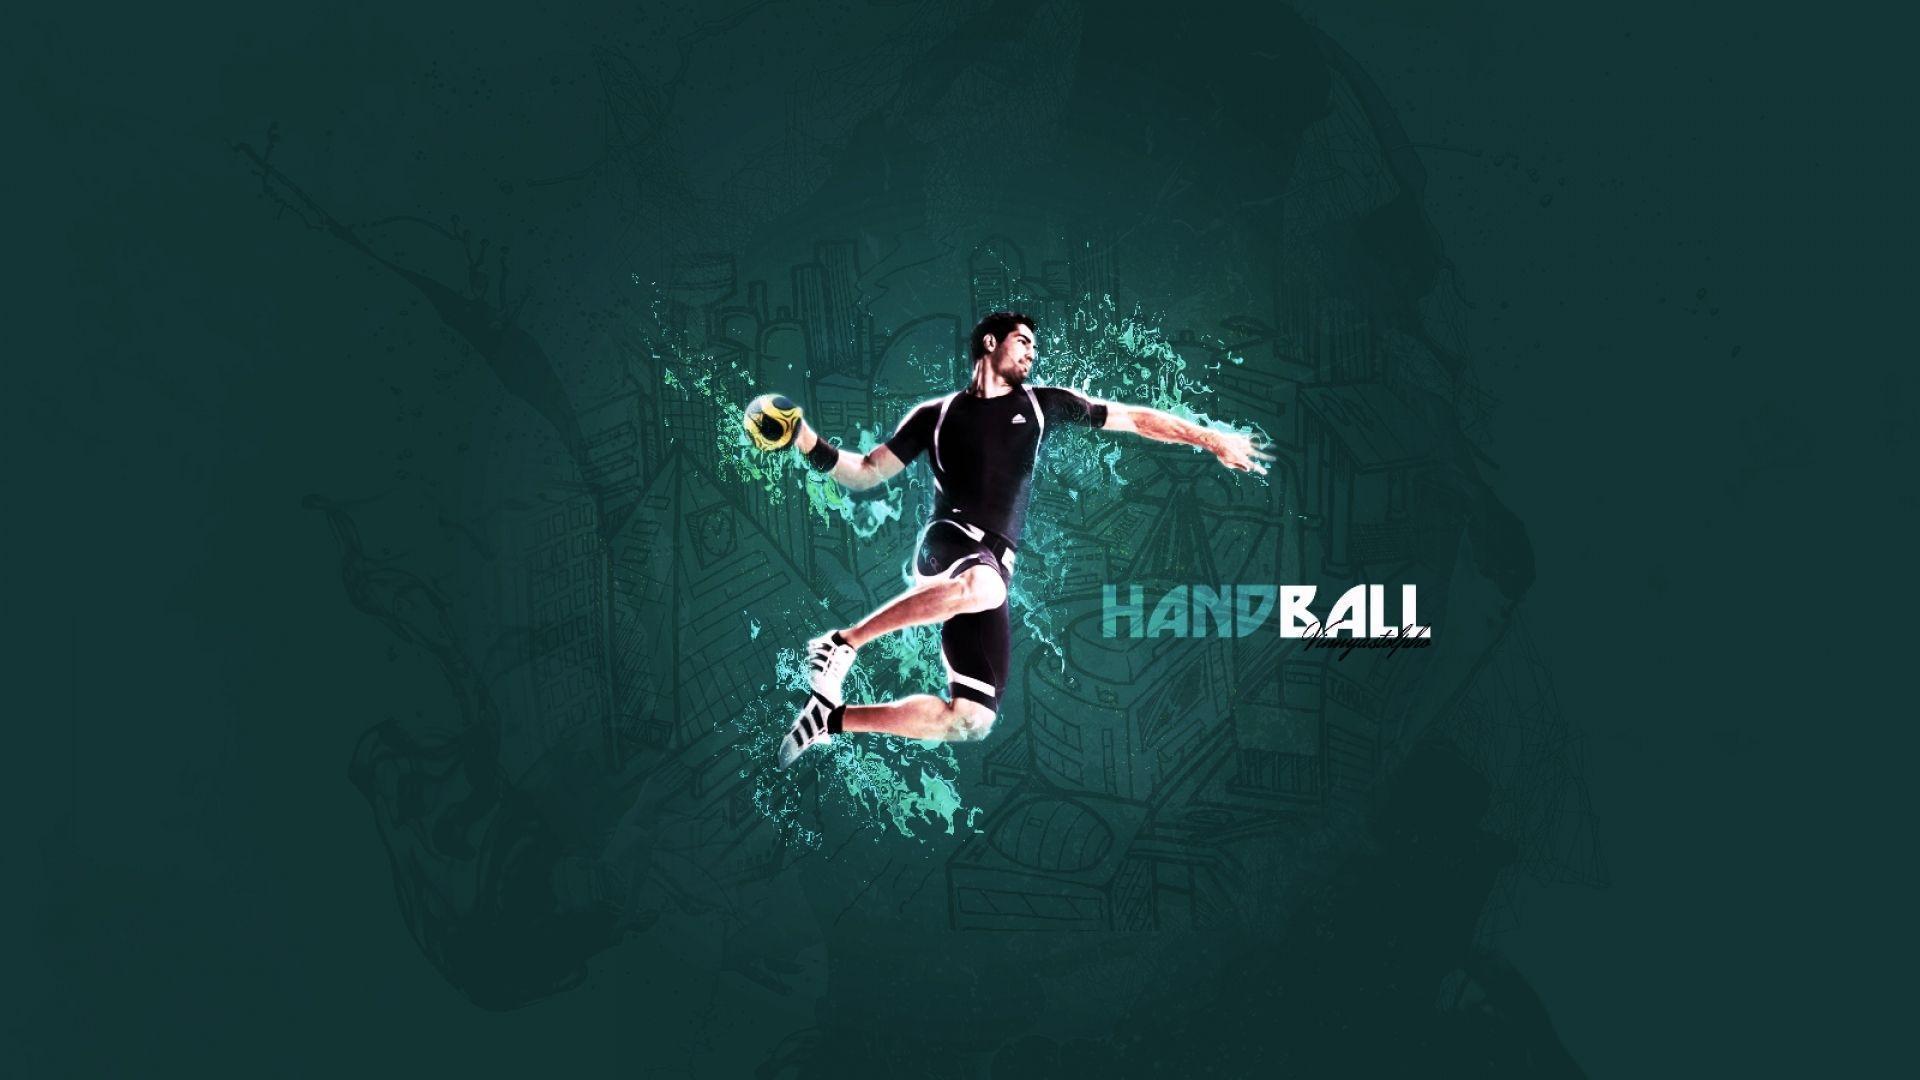 handball wallpapers wallpaper cave